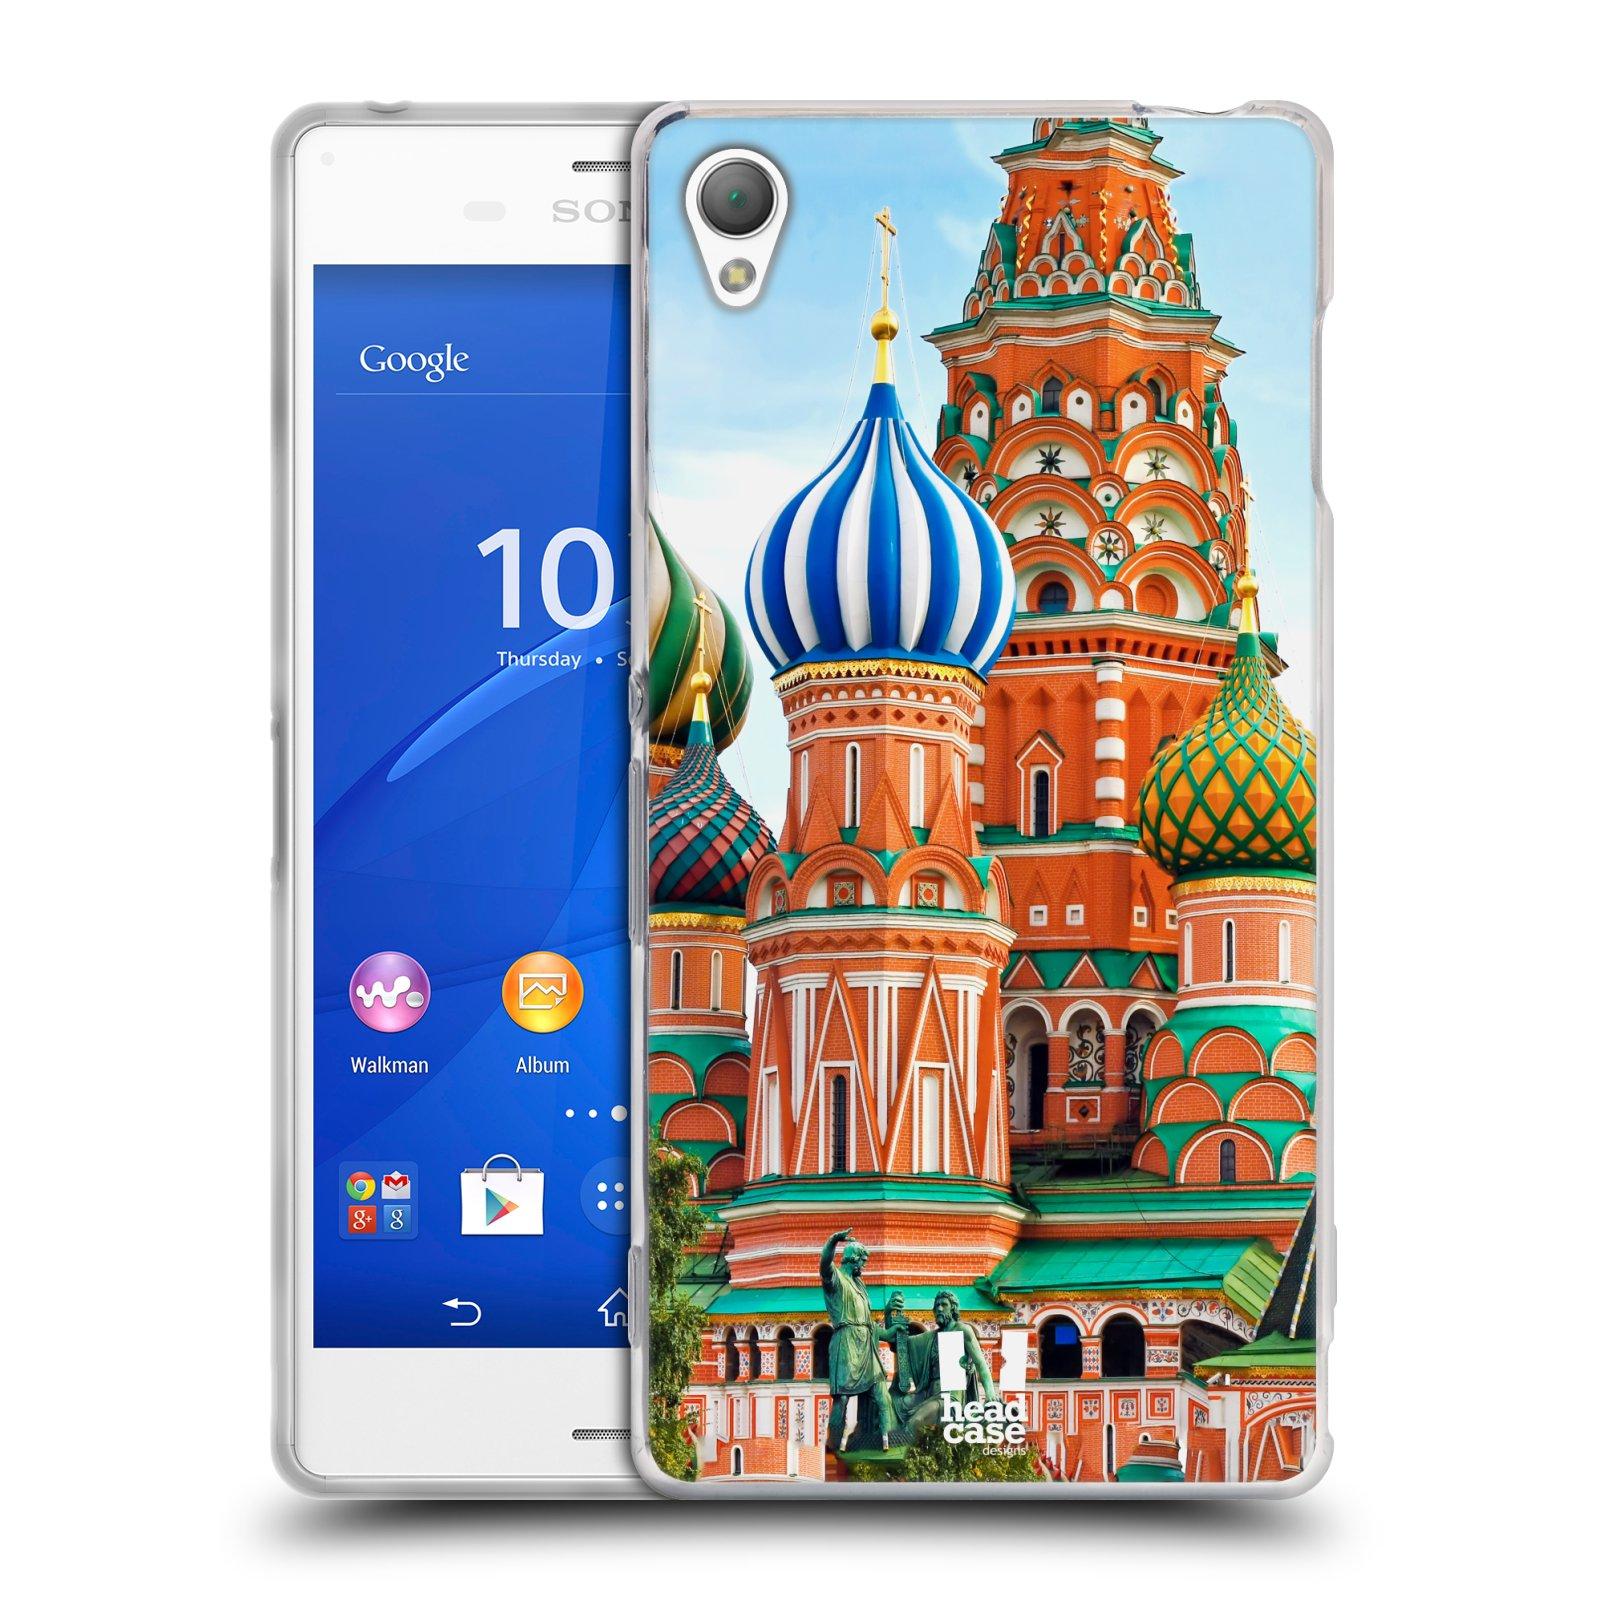 HEAD CASE silikonový obal na mobil Sony Xperia Z3 vzor Města foto náměstí RUSKO,MOSKVA, RUDÉ NÁMĚSTÍ